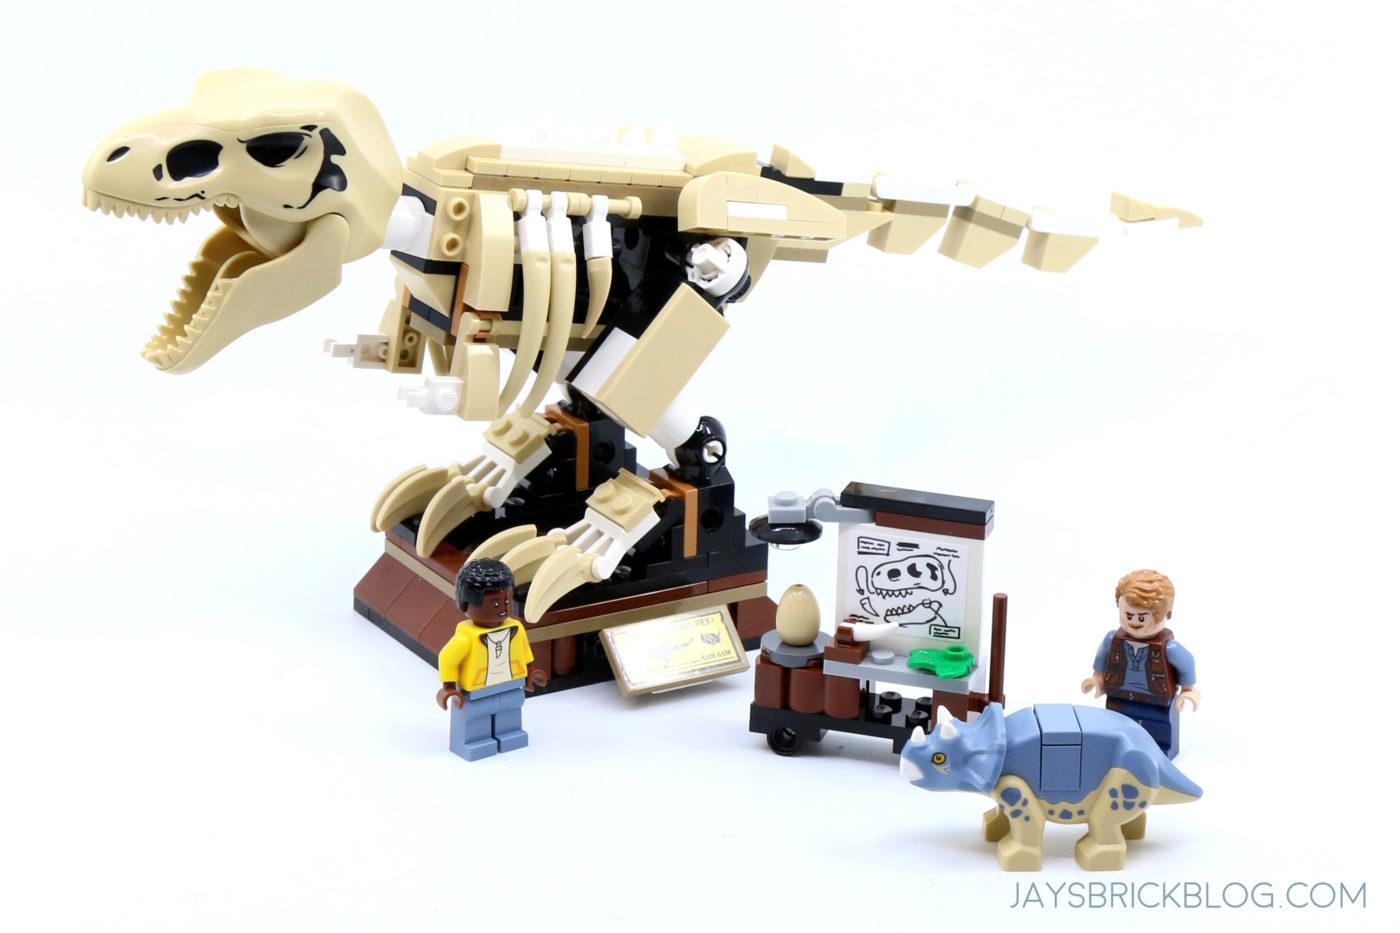 LEGO 76940 T. rex Dinosaur Fossil Exhibition Set Photo